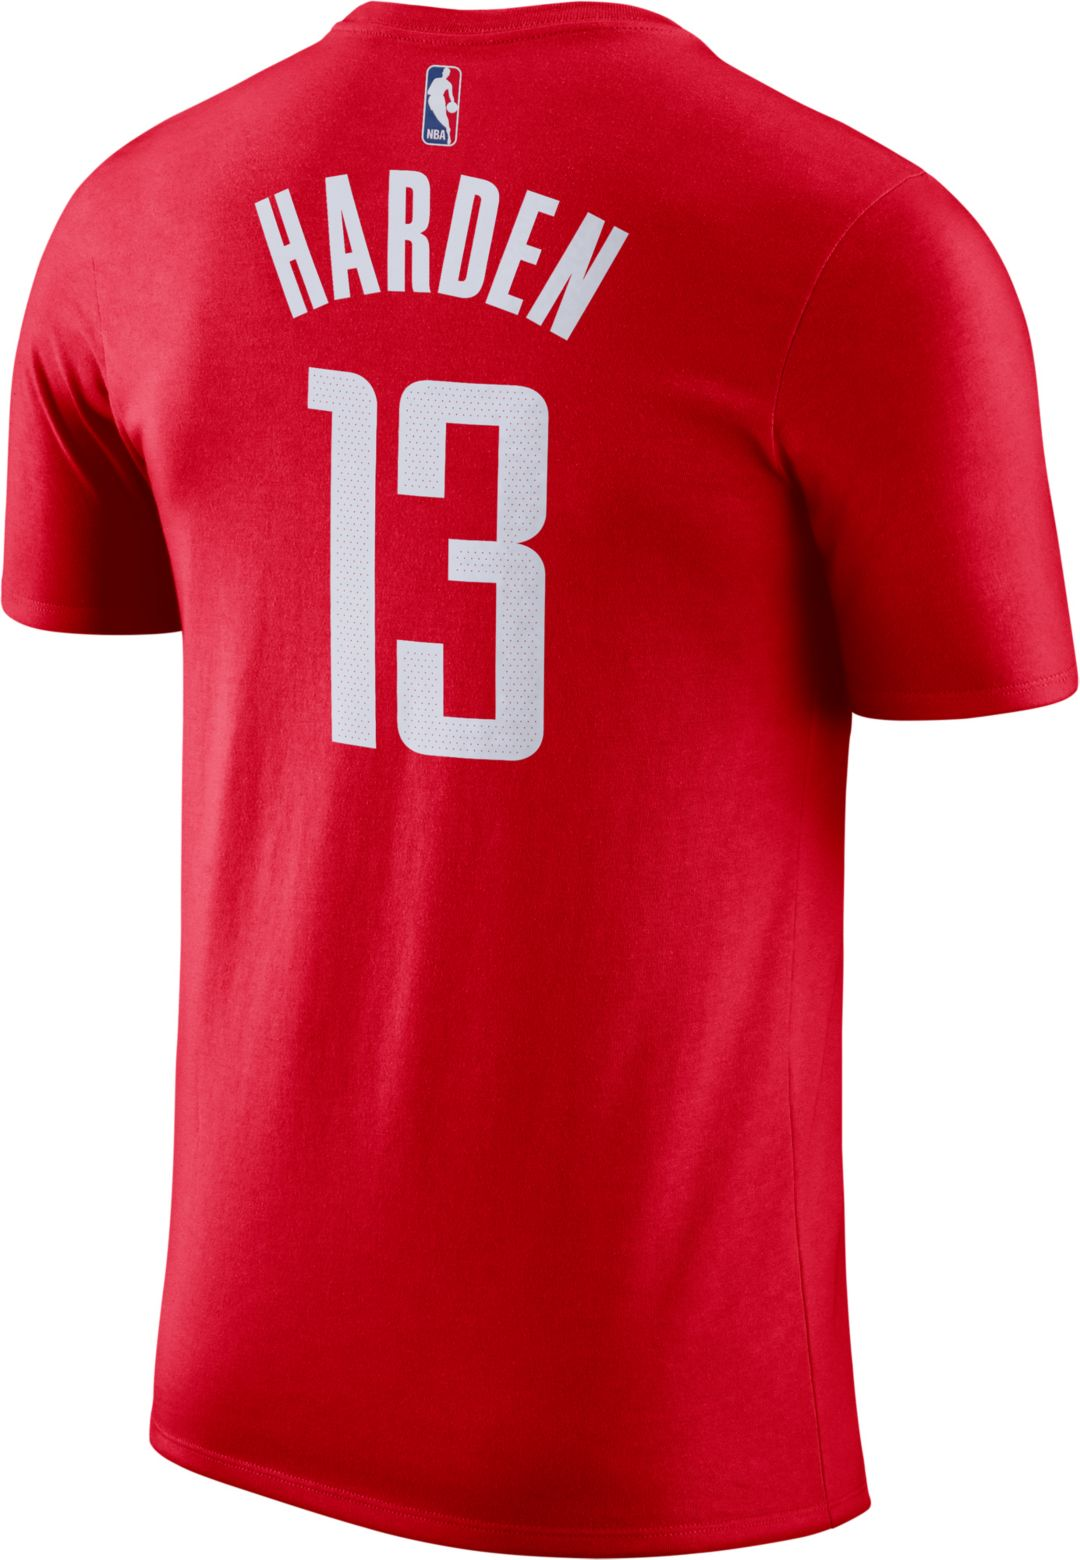 new styles 6dd52 20ffd Nike Men's Houston Rockets James Harden #13 Dri-FIT Red T-Shirt